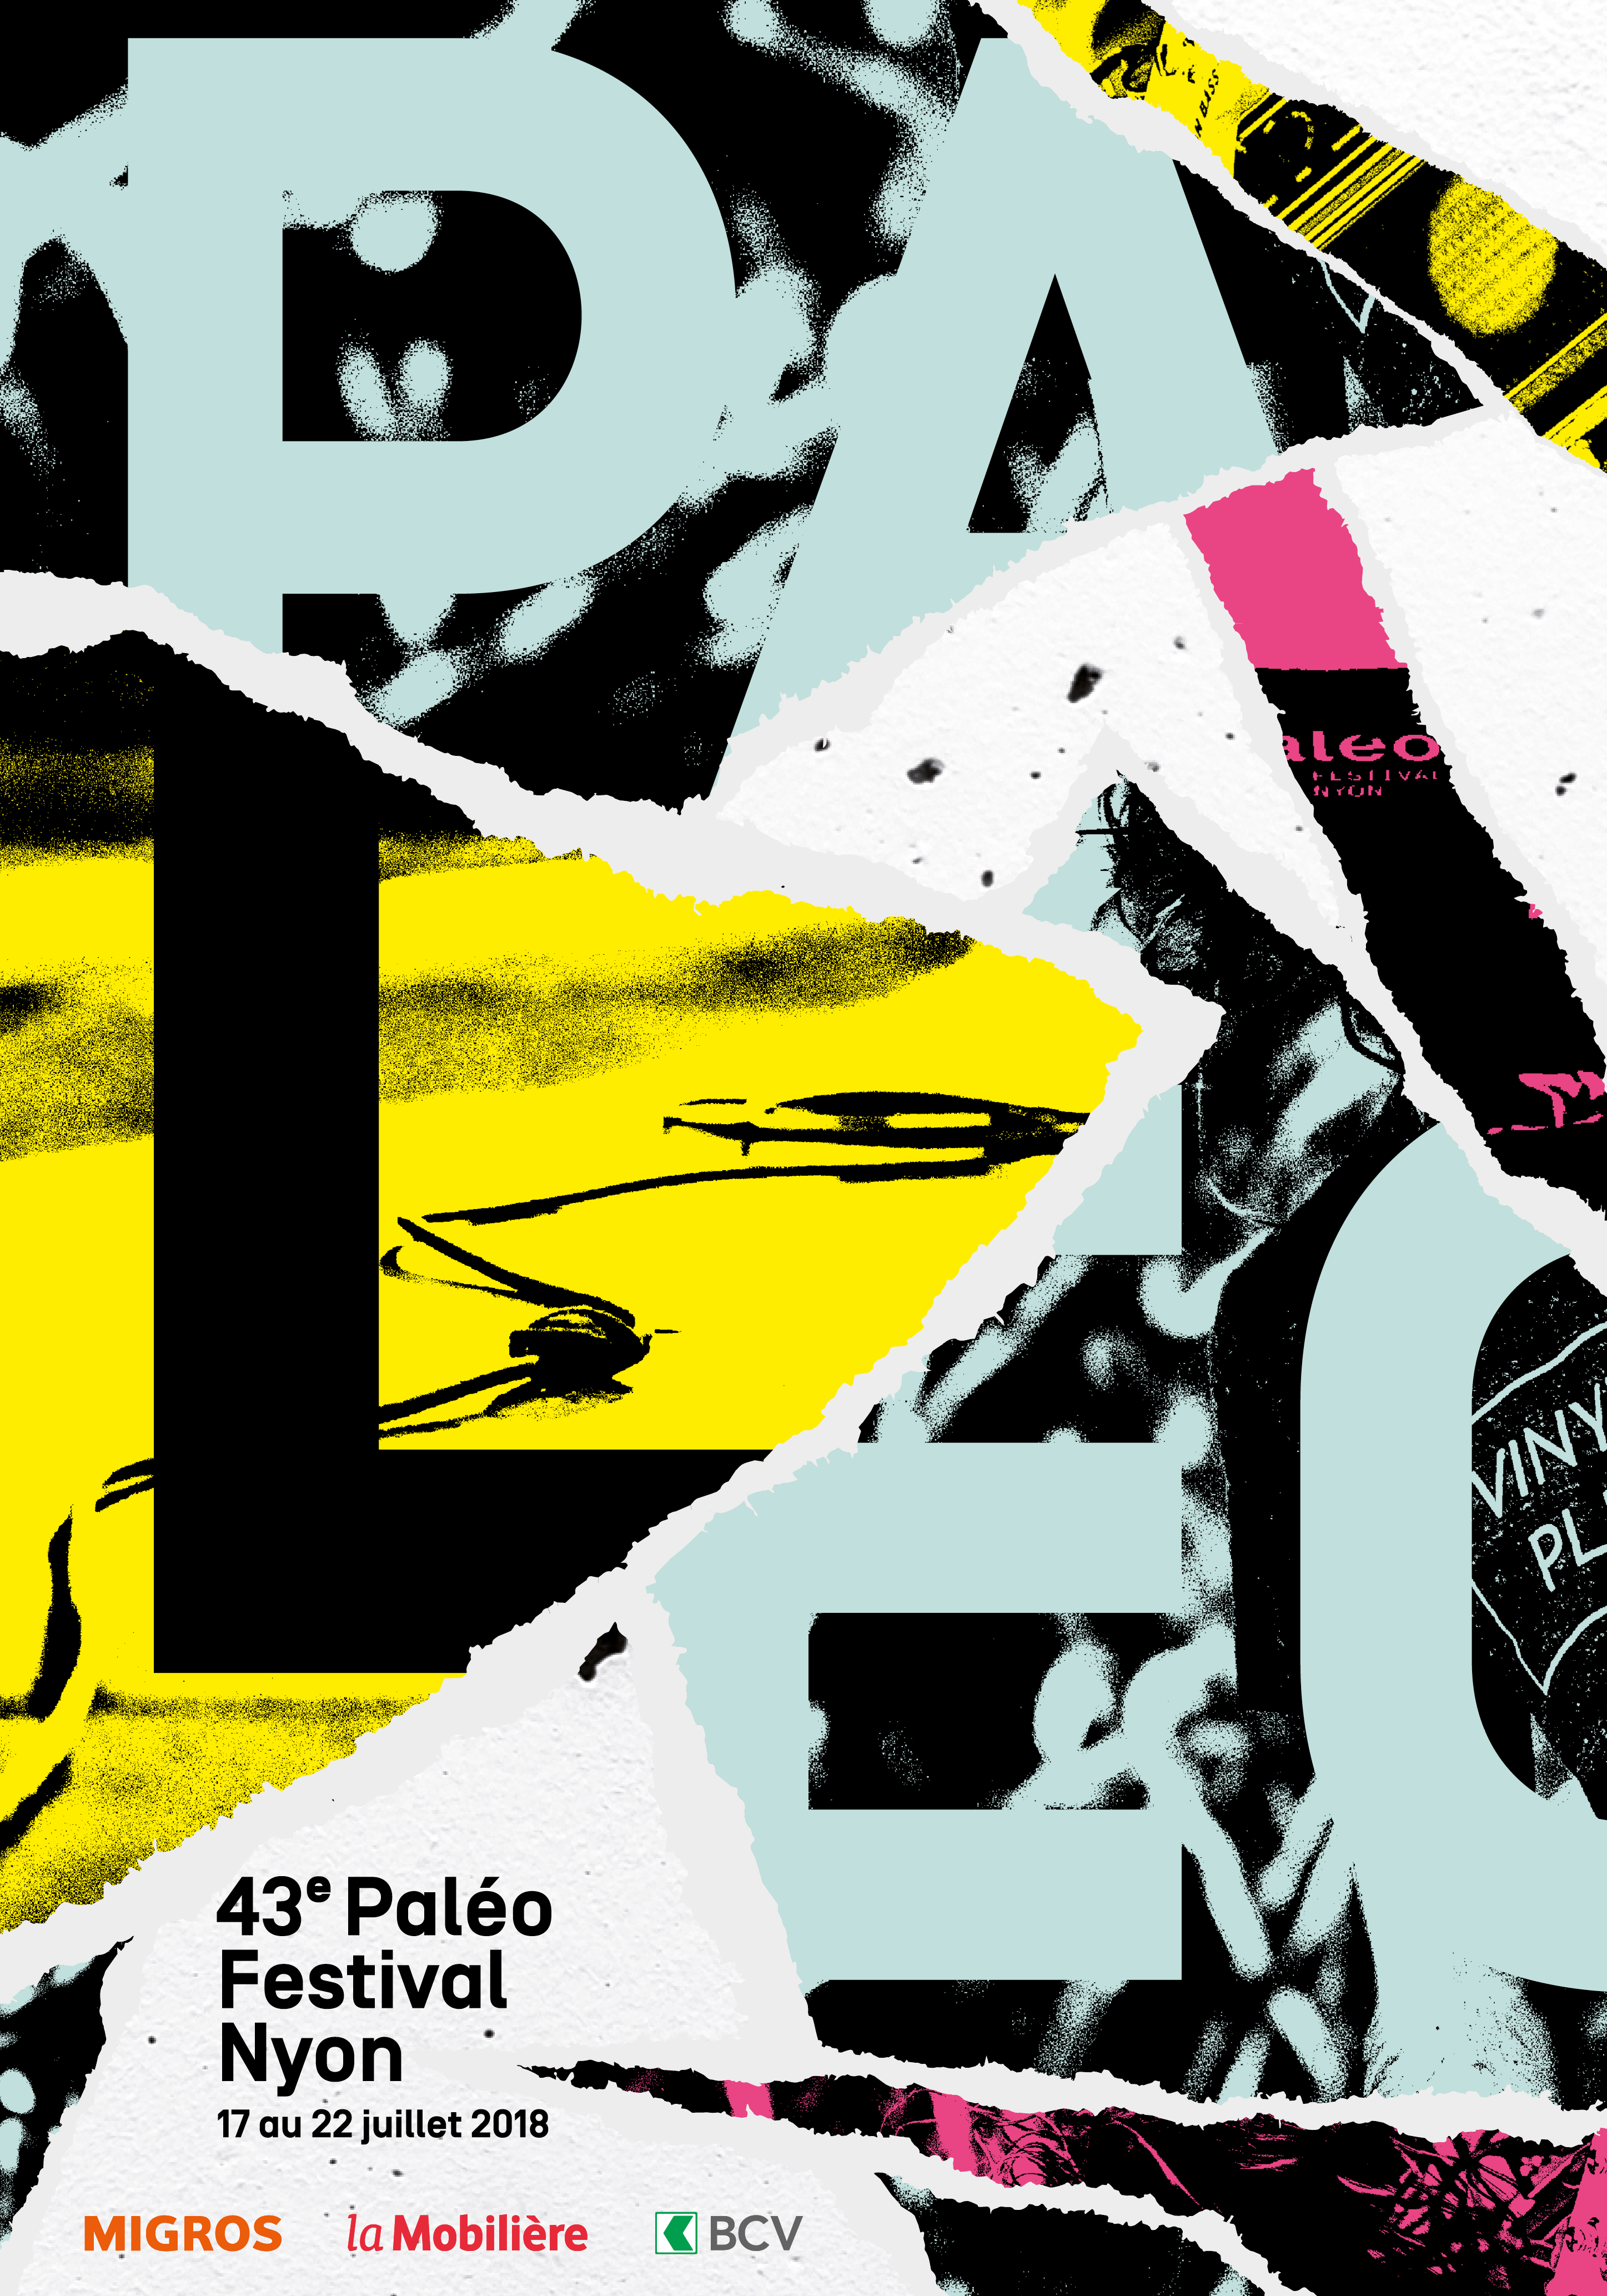 Paleo_affiche2018_WEB.png